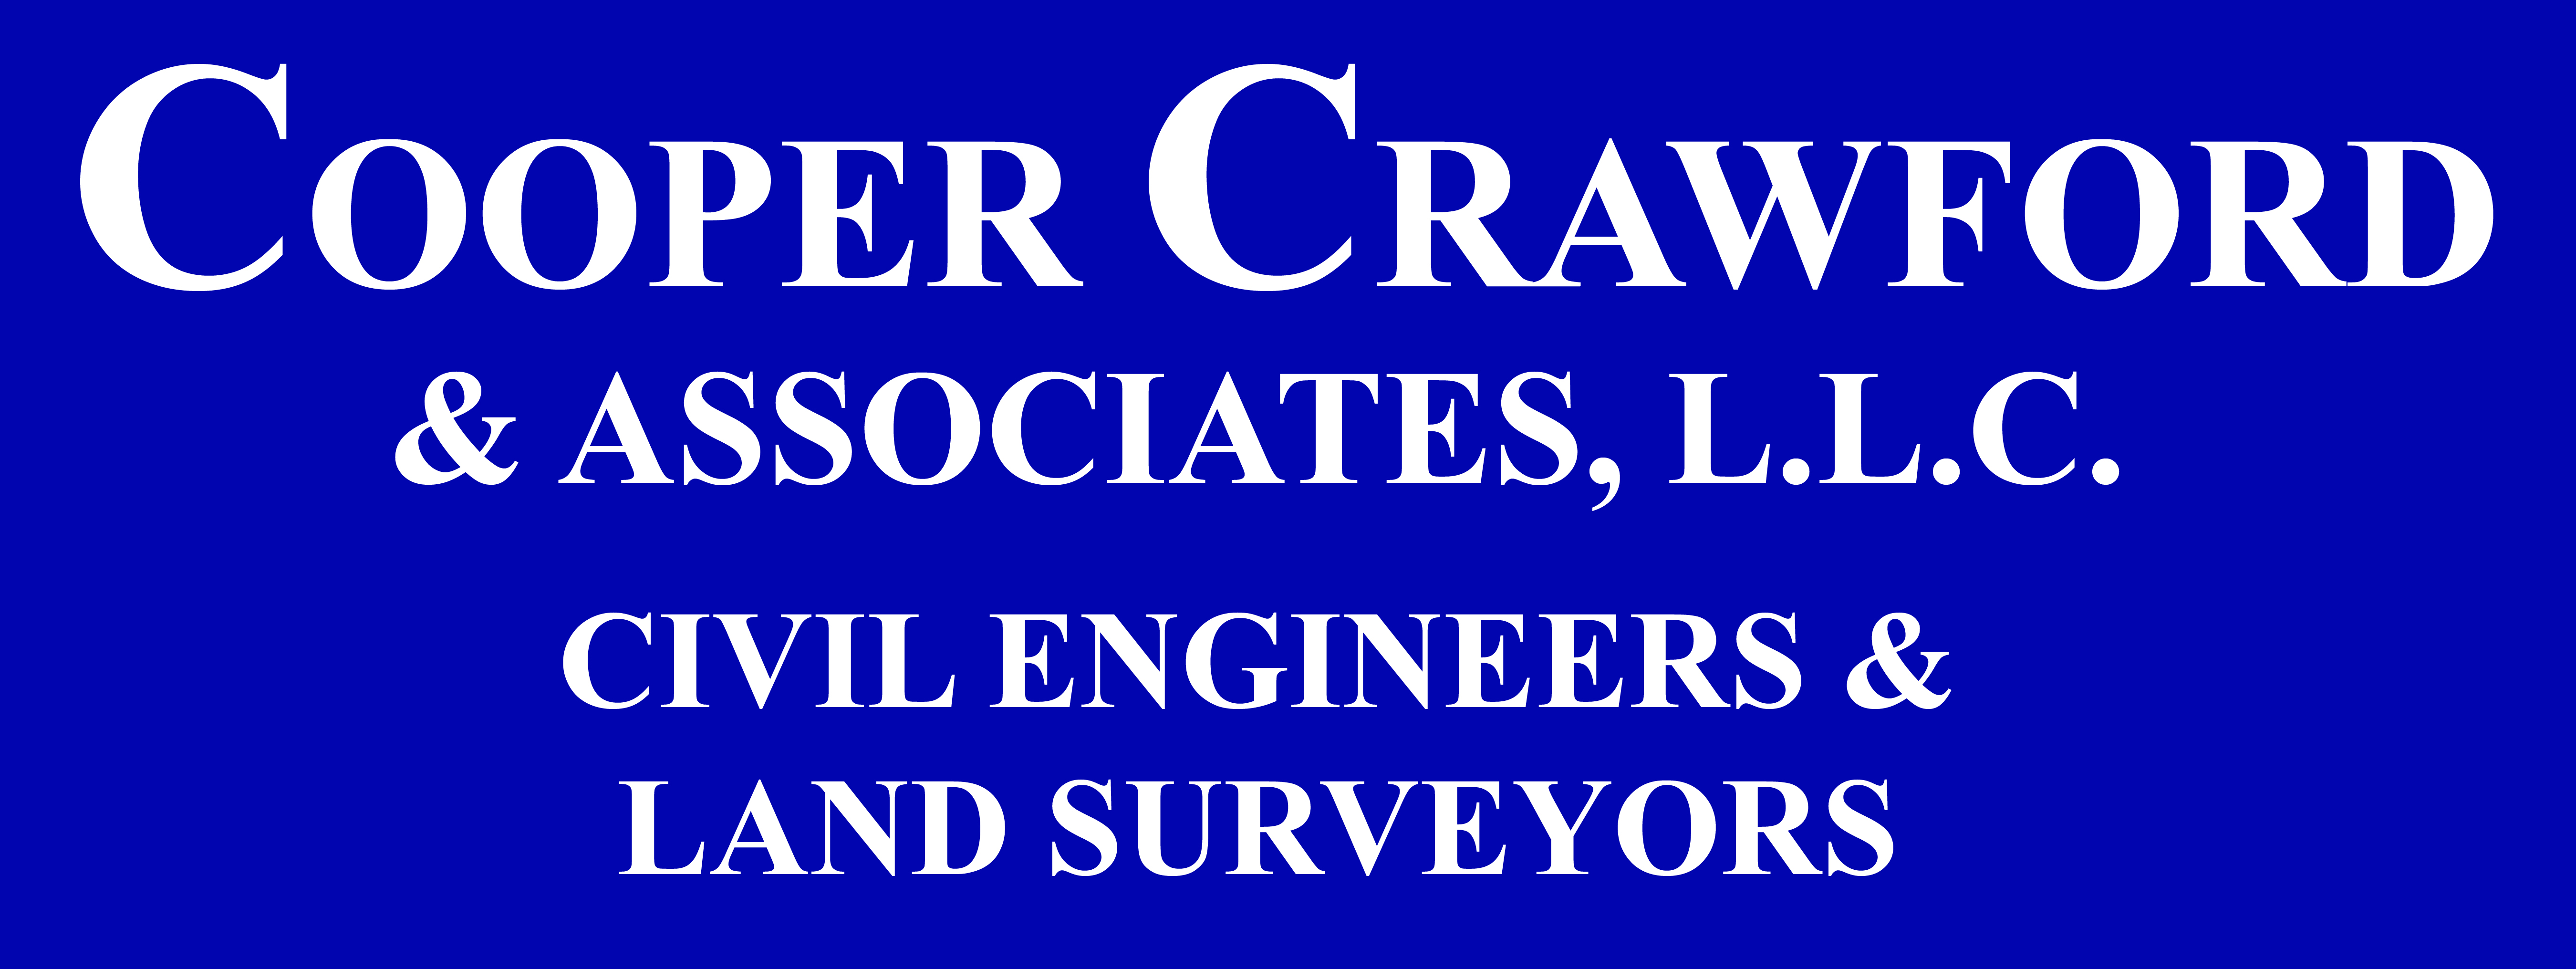 Cooper Crawford & Associates